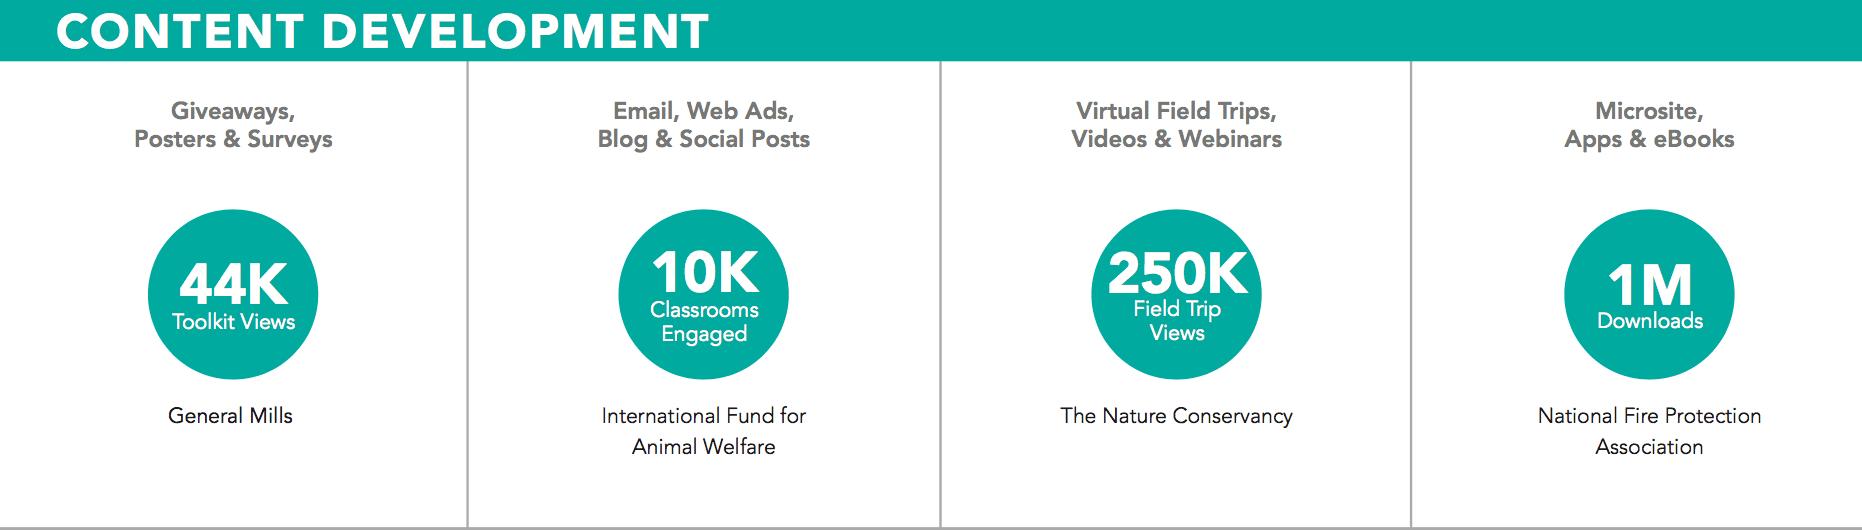 Content Development stats graphic